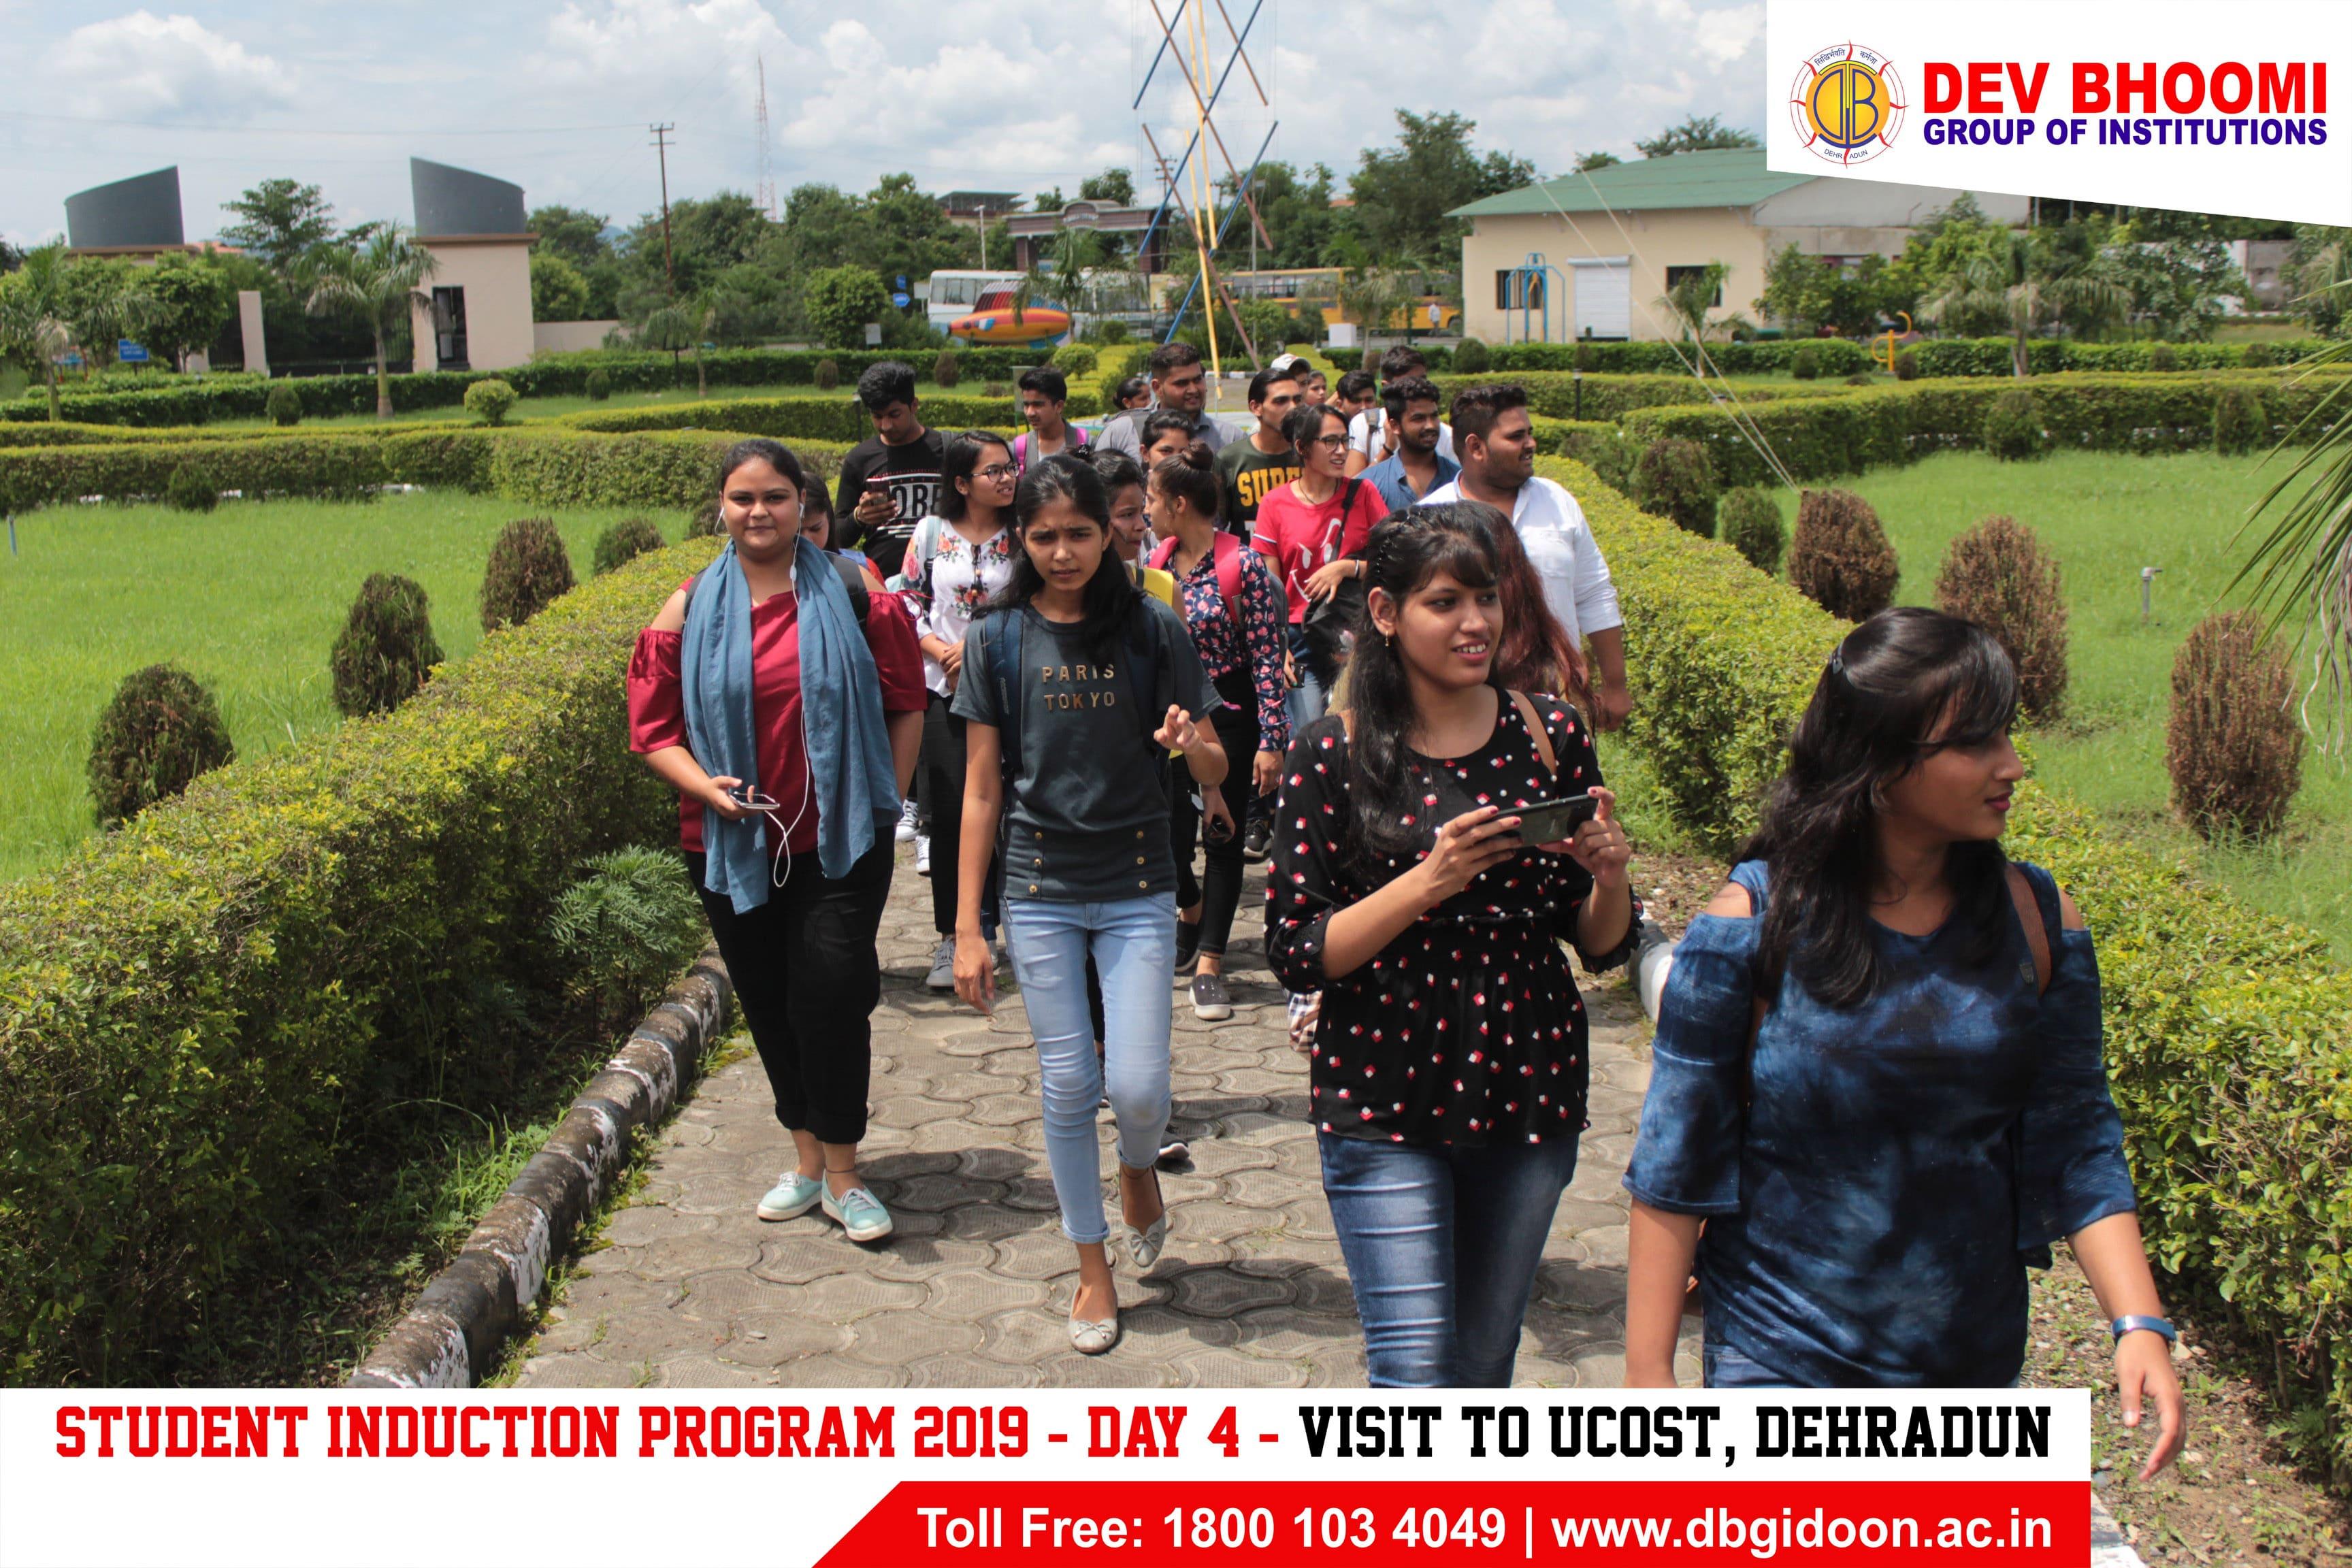 Induction Program for Freshers 2019-20 – Educational Visits